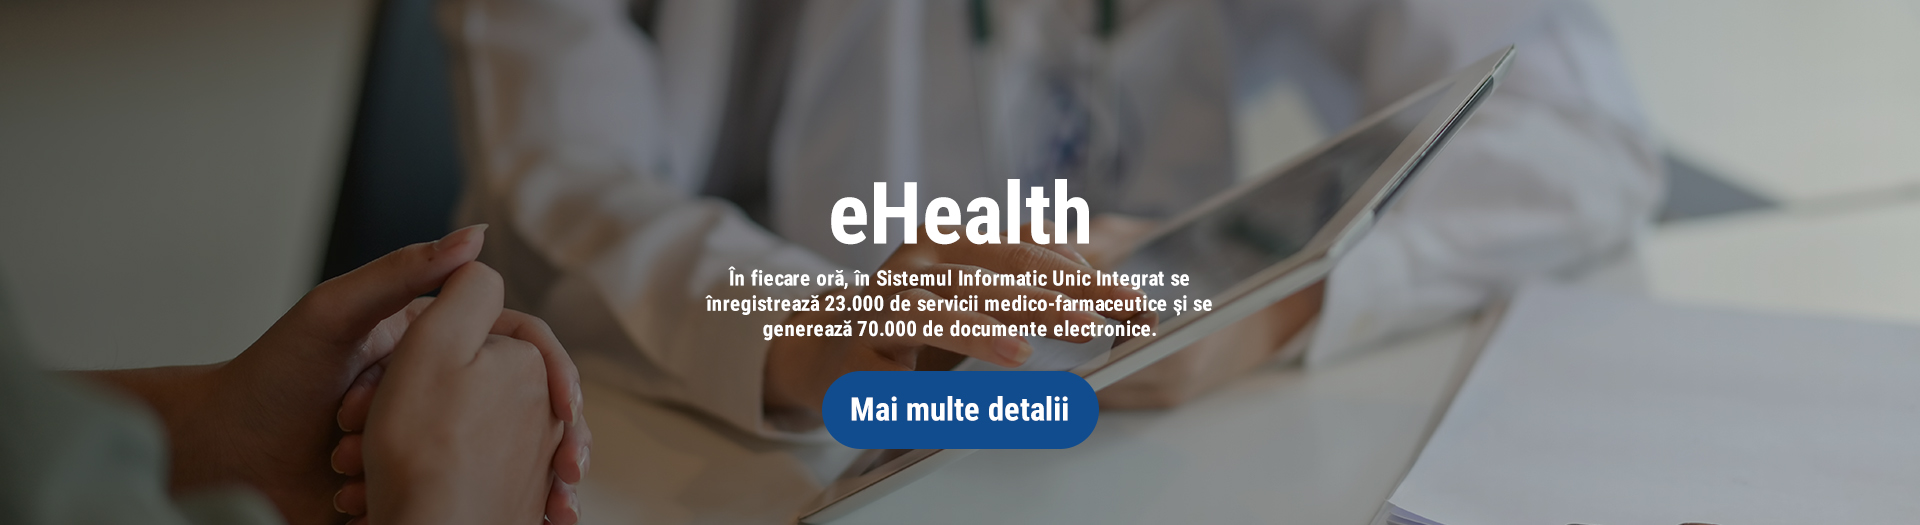 https://www.simavi.ro/ehealth